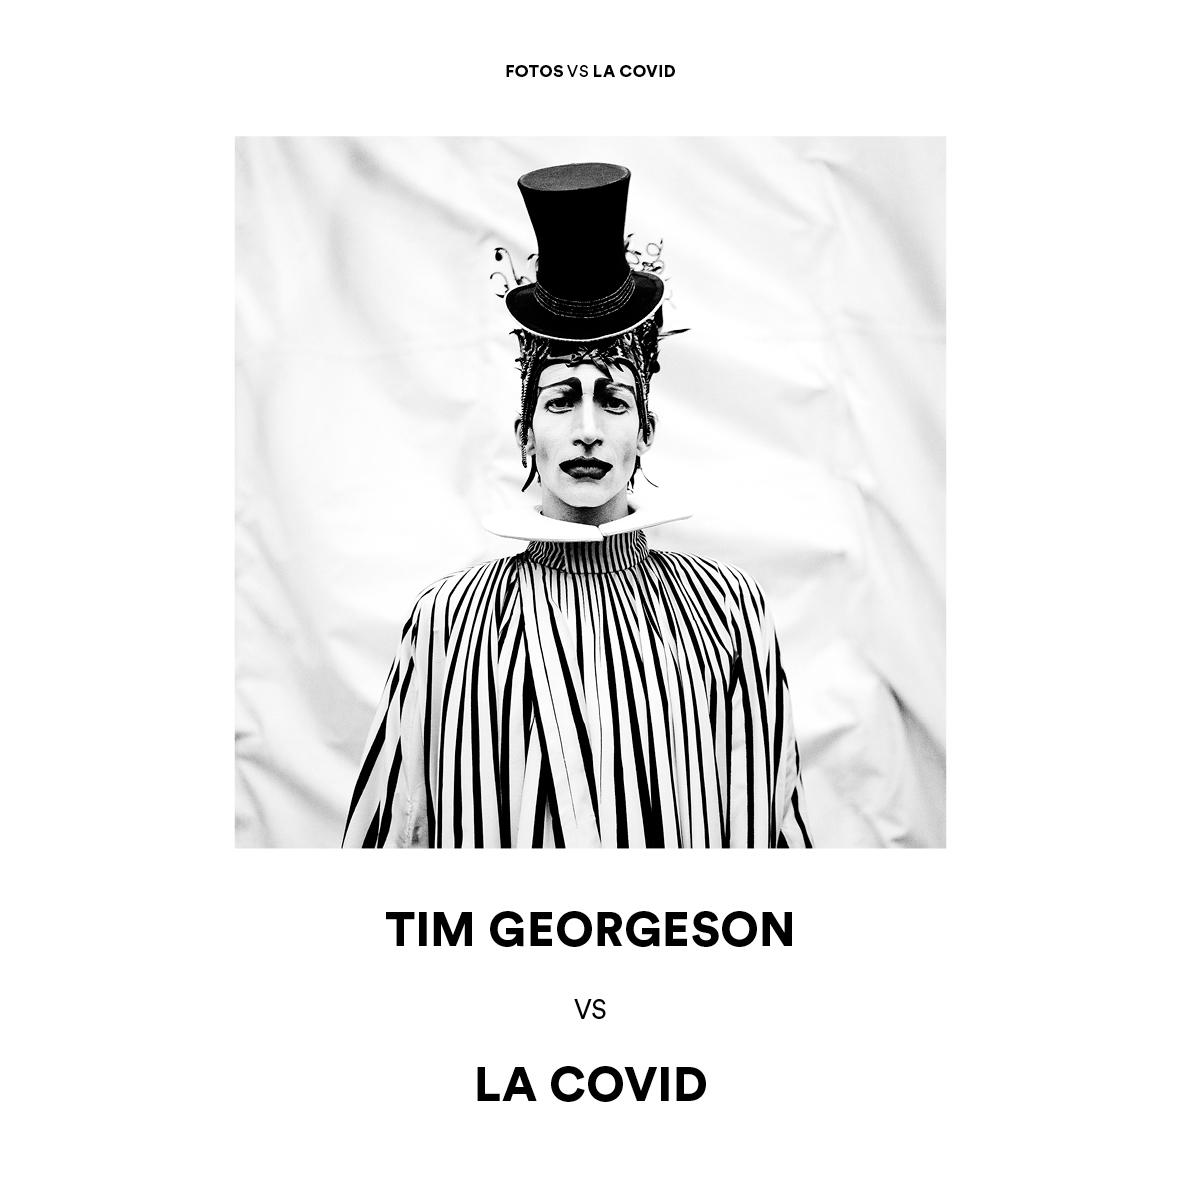 Tim Georgeson POST